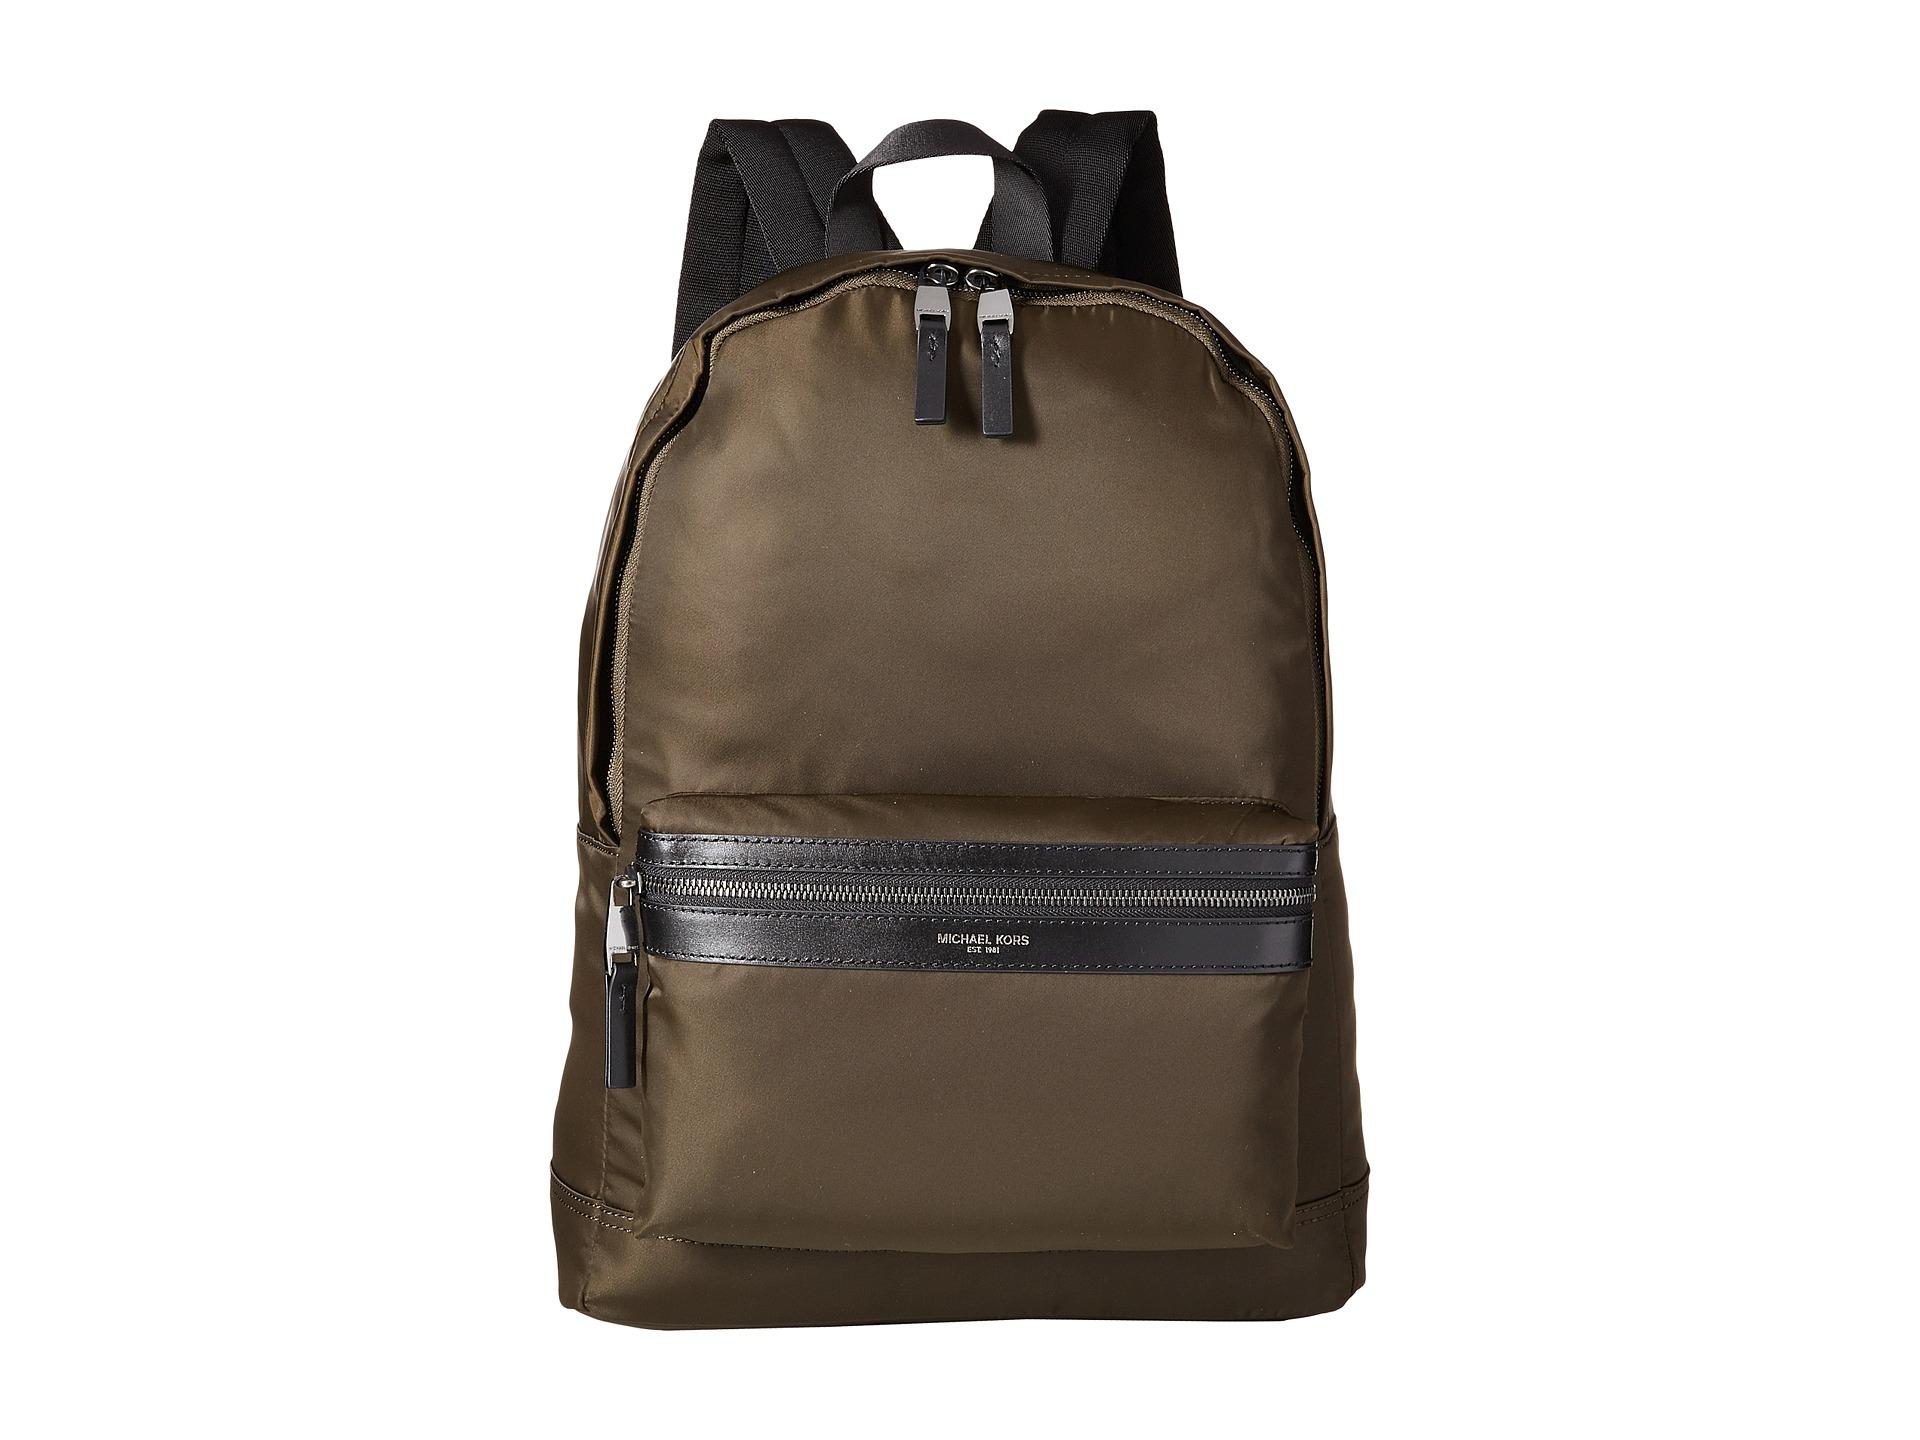 cd4603a4a8 Lyst - Michael Kors Kent Lightweight Nylon Backpack in Green for Men